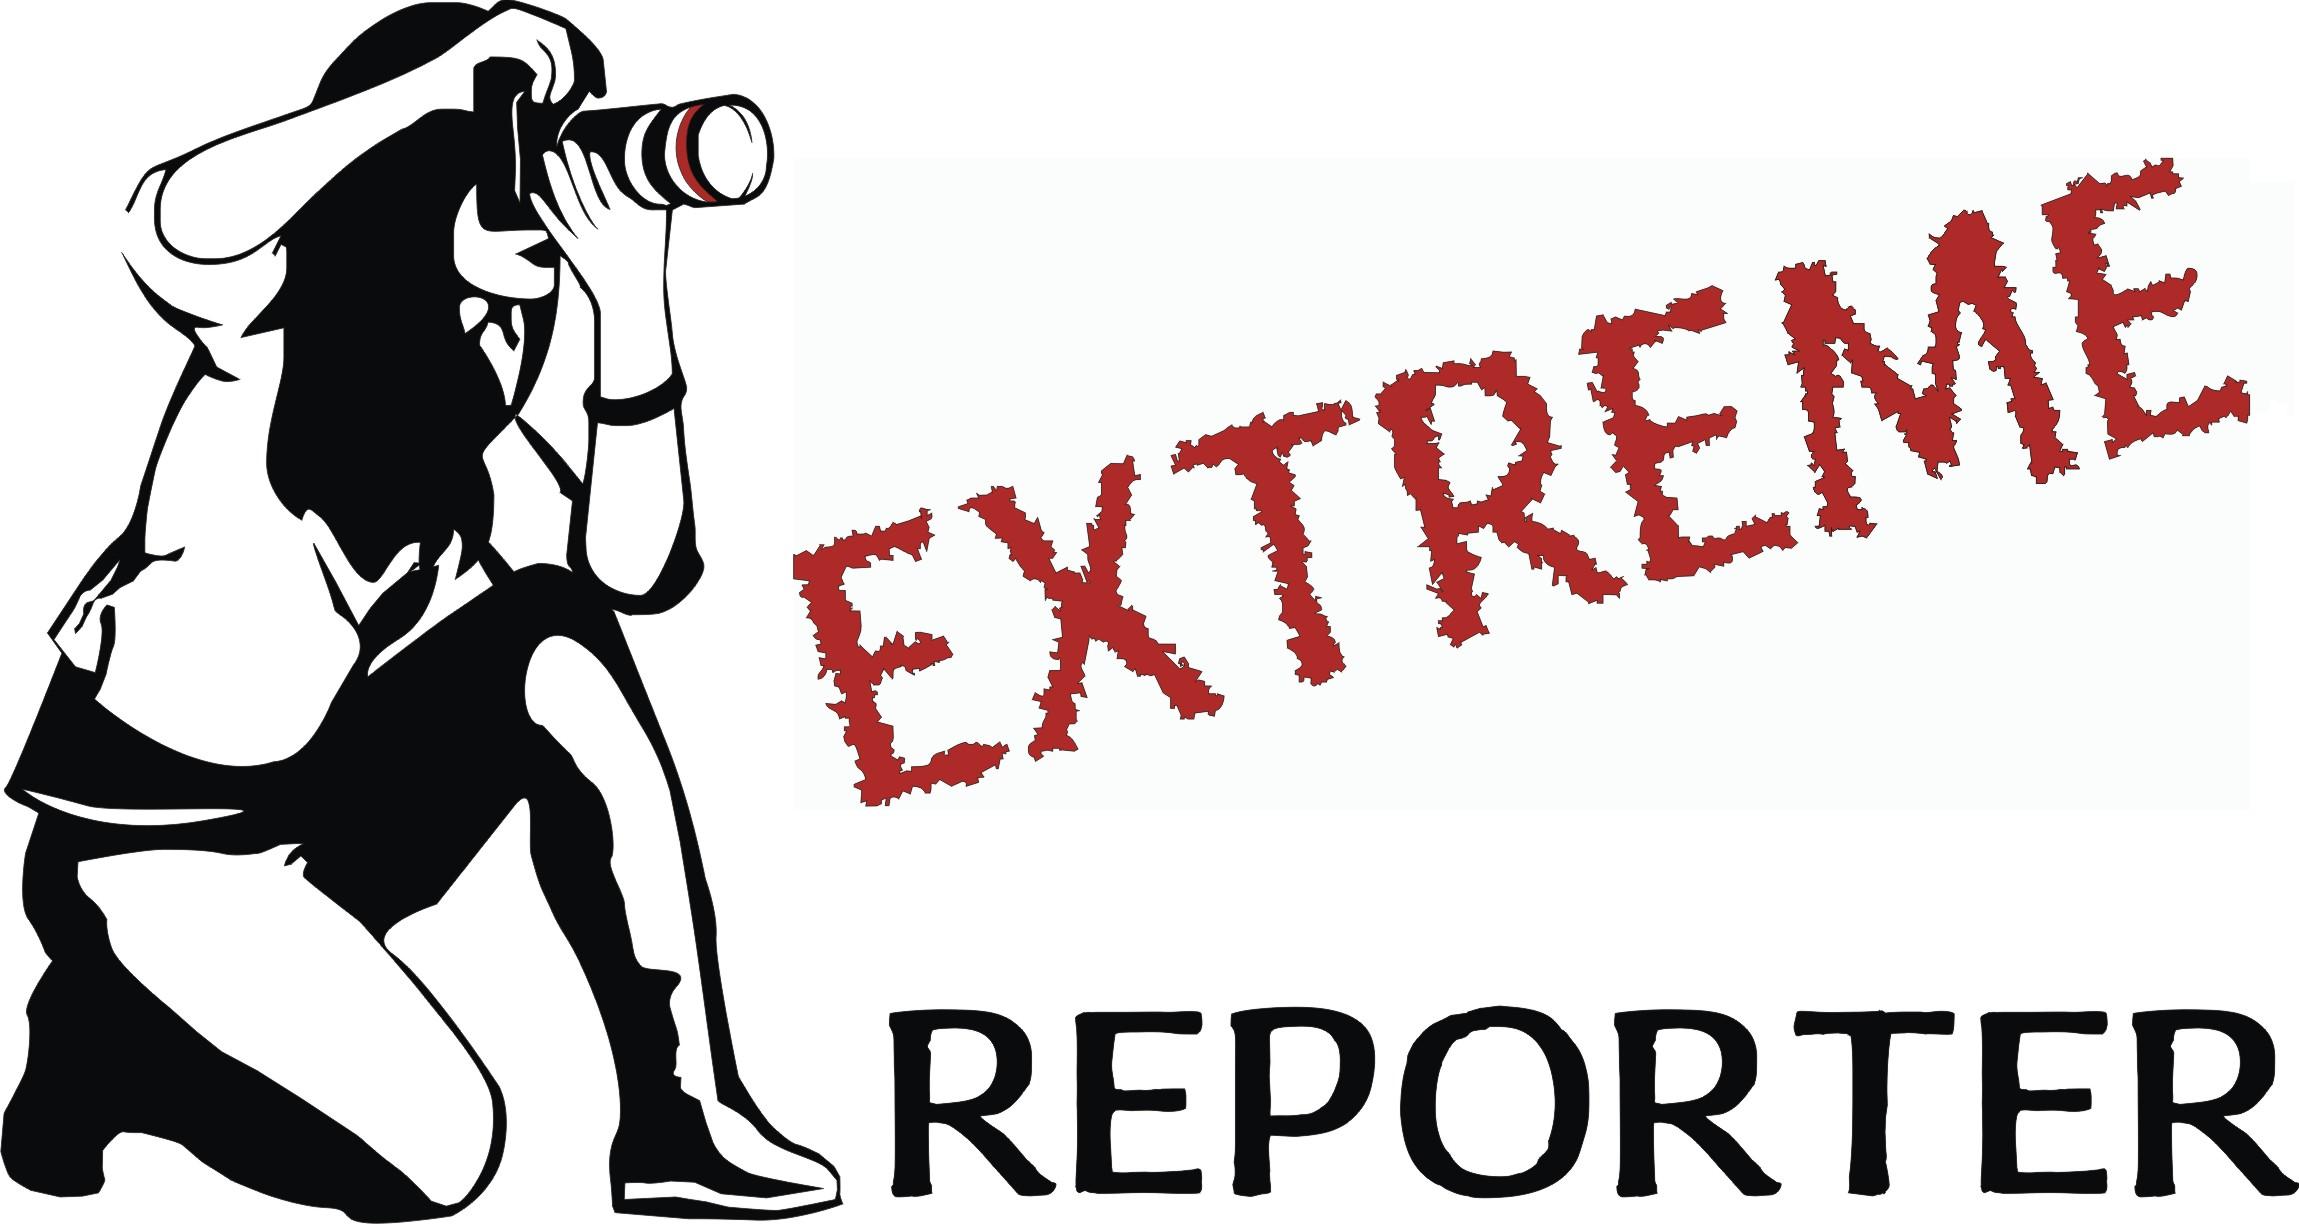 Логотип для экстрим фотографа.  фото f_2495a53e77f1806b.jpg